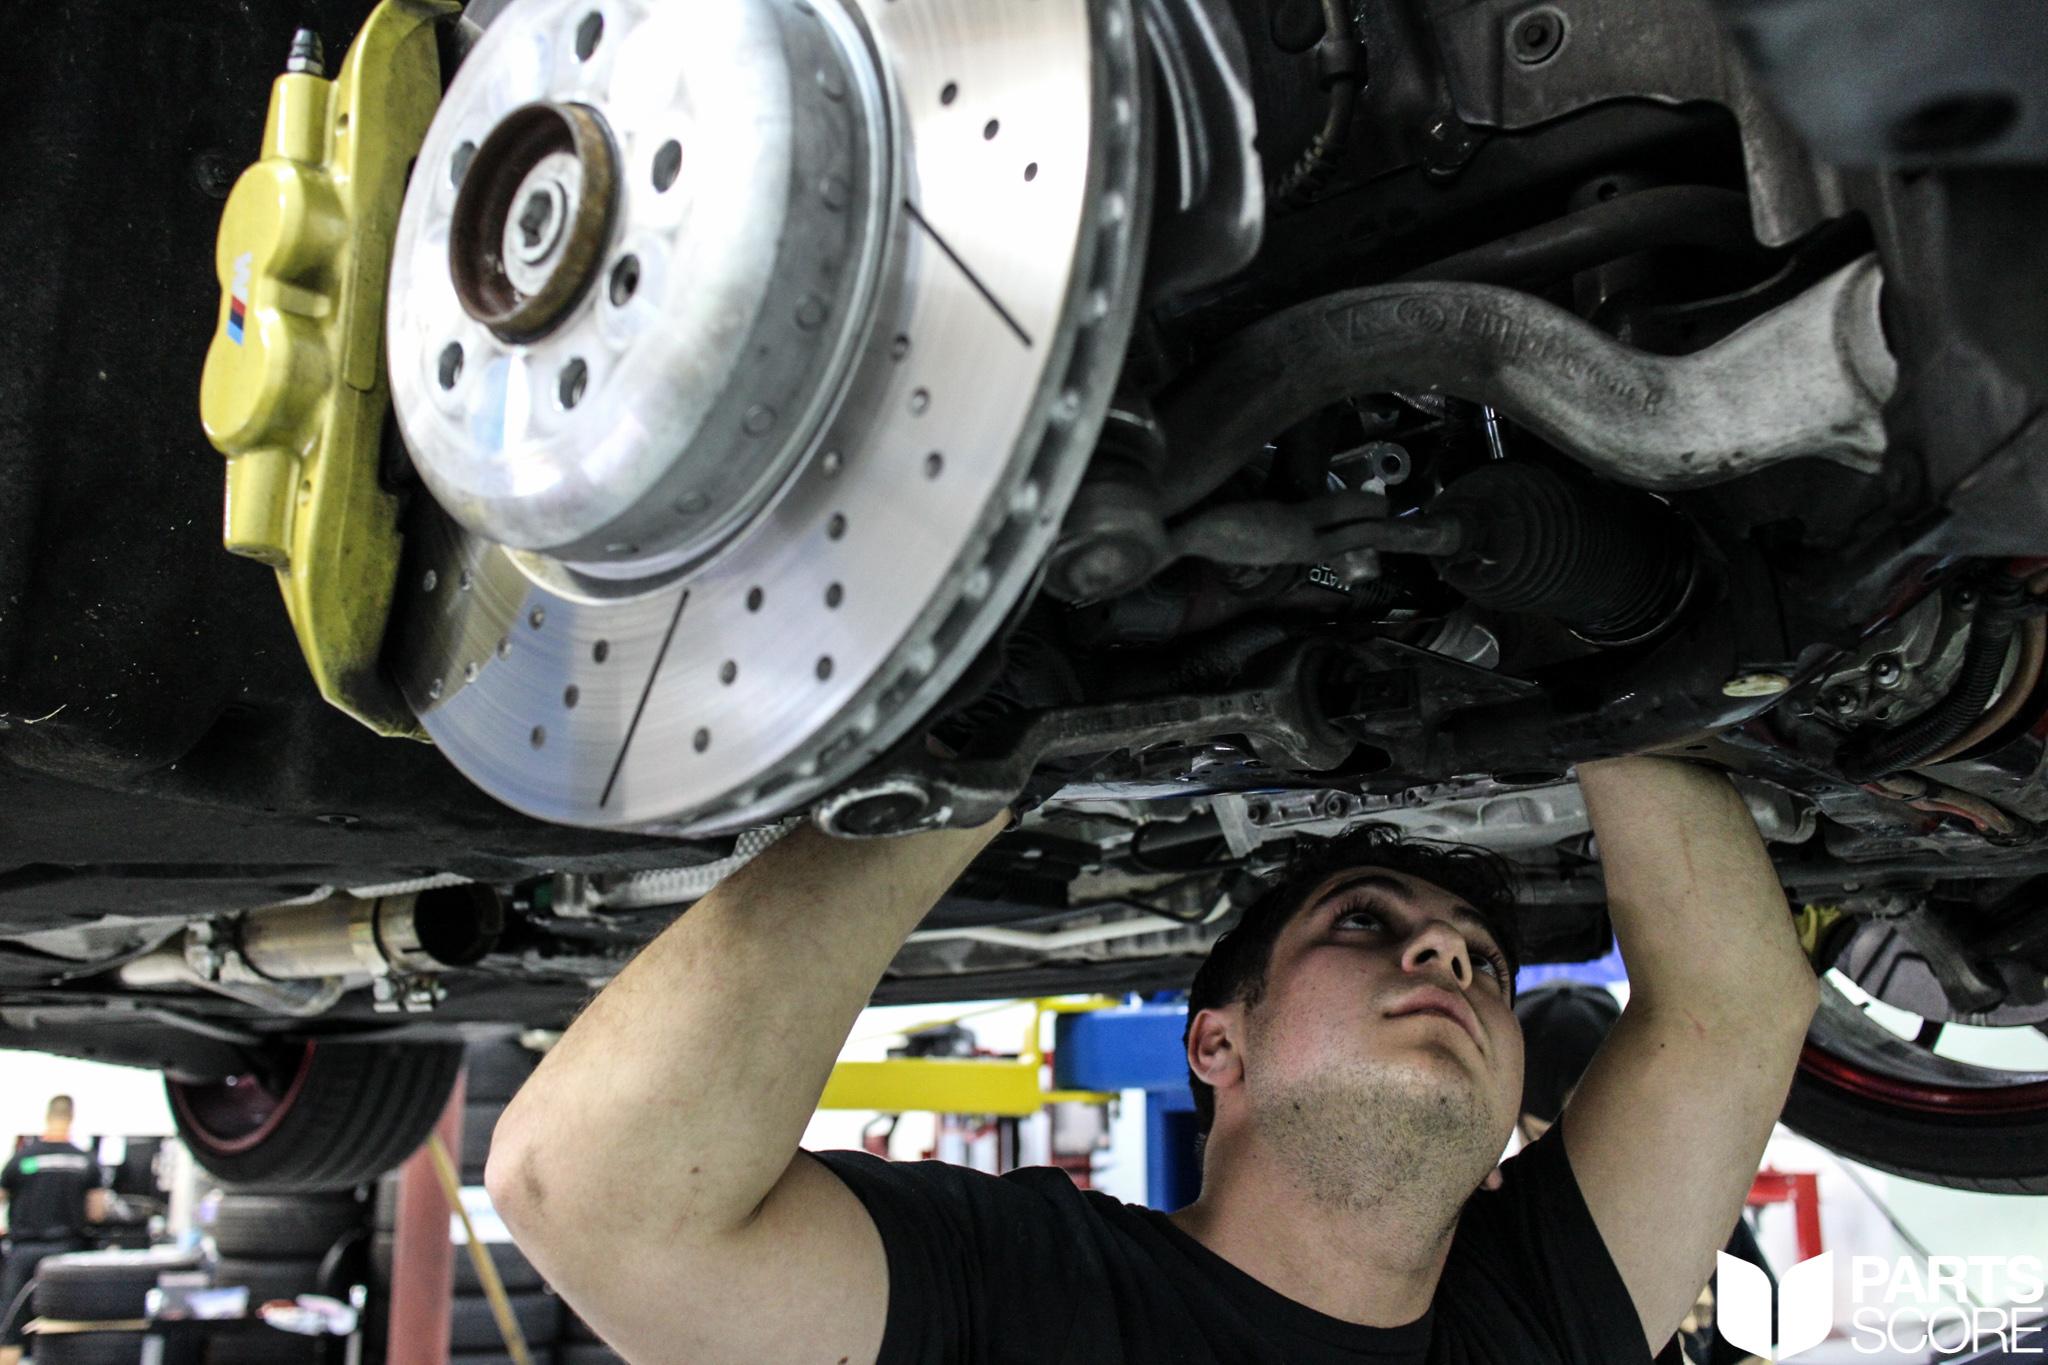 335i, 335i pure turbo, 335i pure turbos, 335i pure turbos for sale, 335i turbo upgrade, 335i turbo upgrades, amp, arizona motorsports, BMW, bmw m, bmw m performance, bmw m power, bmw m2, bmw m3, BMW M4, bmw performance, bmw pure turbos, bmw pure turbos installation, bmwf80, bmwf82, bmwf83, bmwf8x, bmwgram, bmwgramm, bmwm, bmwm3, bmwm4, bmwmods, bmwmperformance, bmwmpower, boost, buy bmw pure turbo, buy pure turbo, buy pure turbos, e60, install pure turbo, n54, n54 pure turbo, n55, n55 pure turbo, parts score, partsscore, peoria, phoenix, pure turbo installation, pure turbo scottsdale, pure turbo upgrade, pure turbos, pure turbos az, pure turbos bmw, pure turbos california, pure turbos scottsdale, race car, racecar, s55, s55 pure turbo, scottsdale, scottsdale az, tempe, turbos for sale, wheelgame